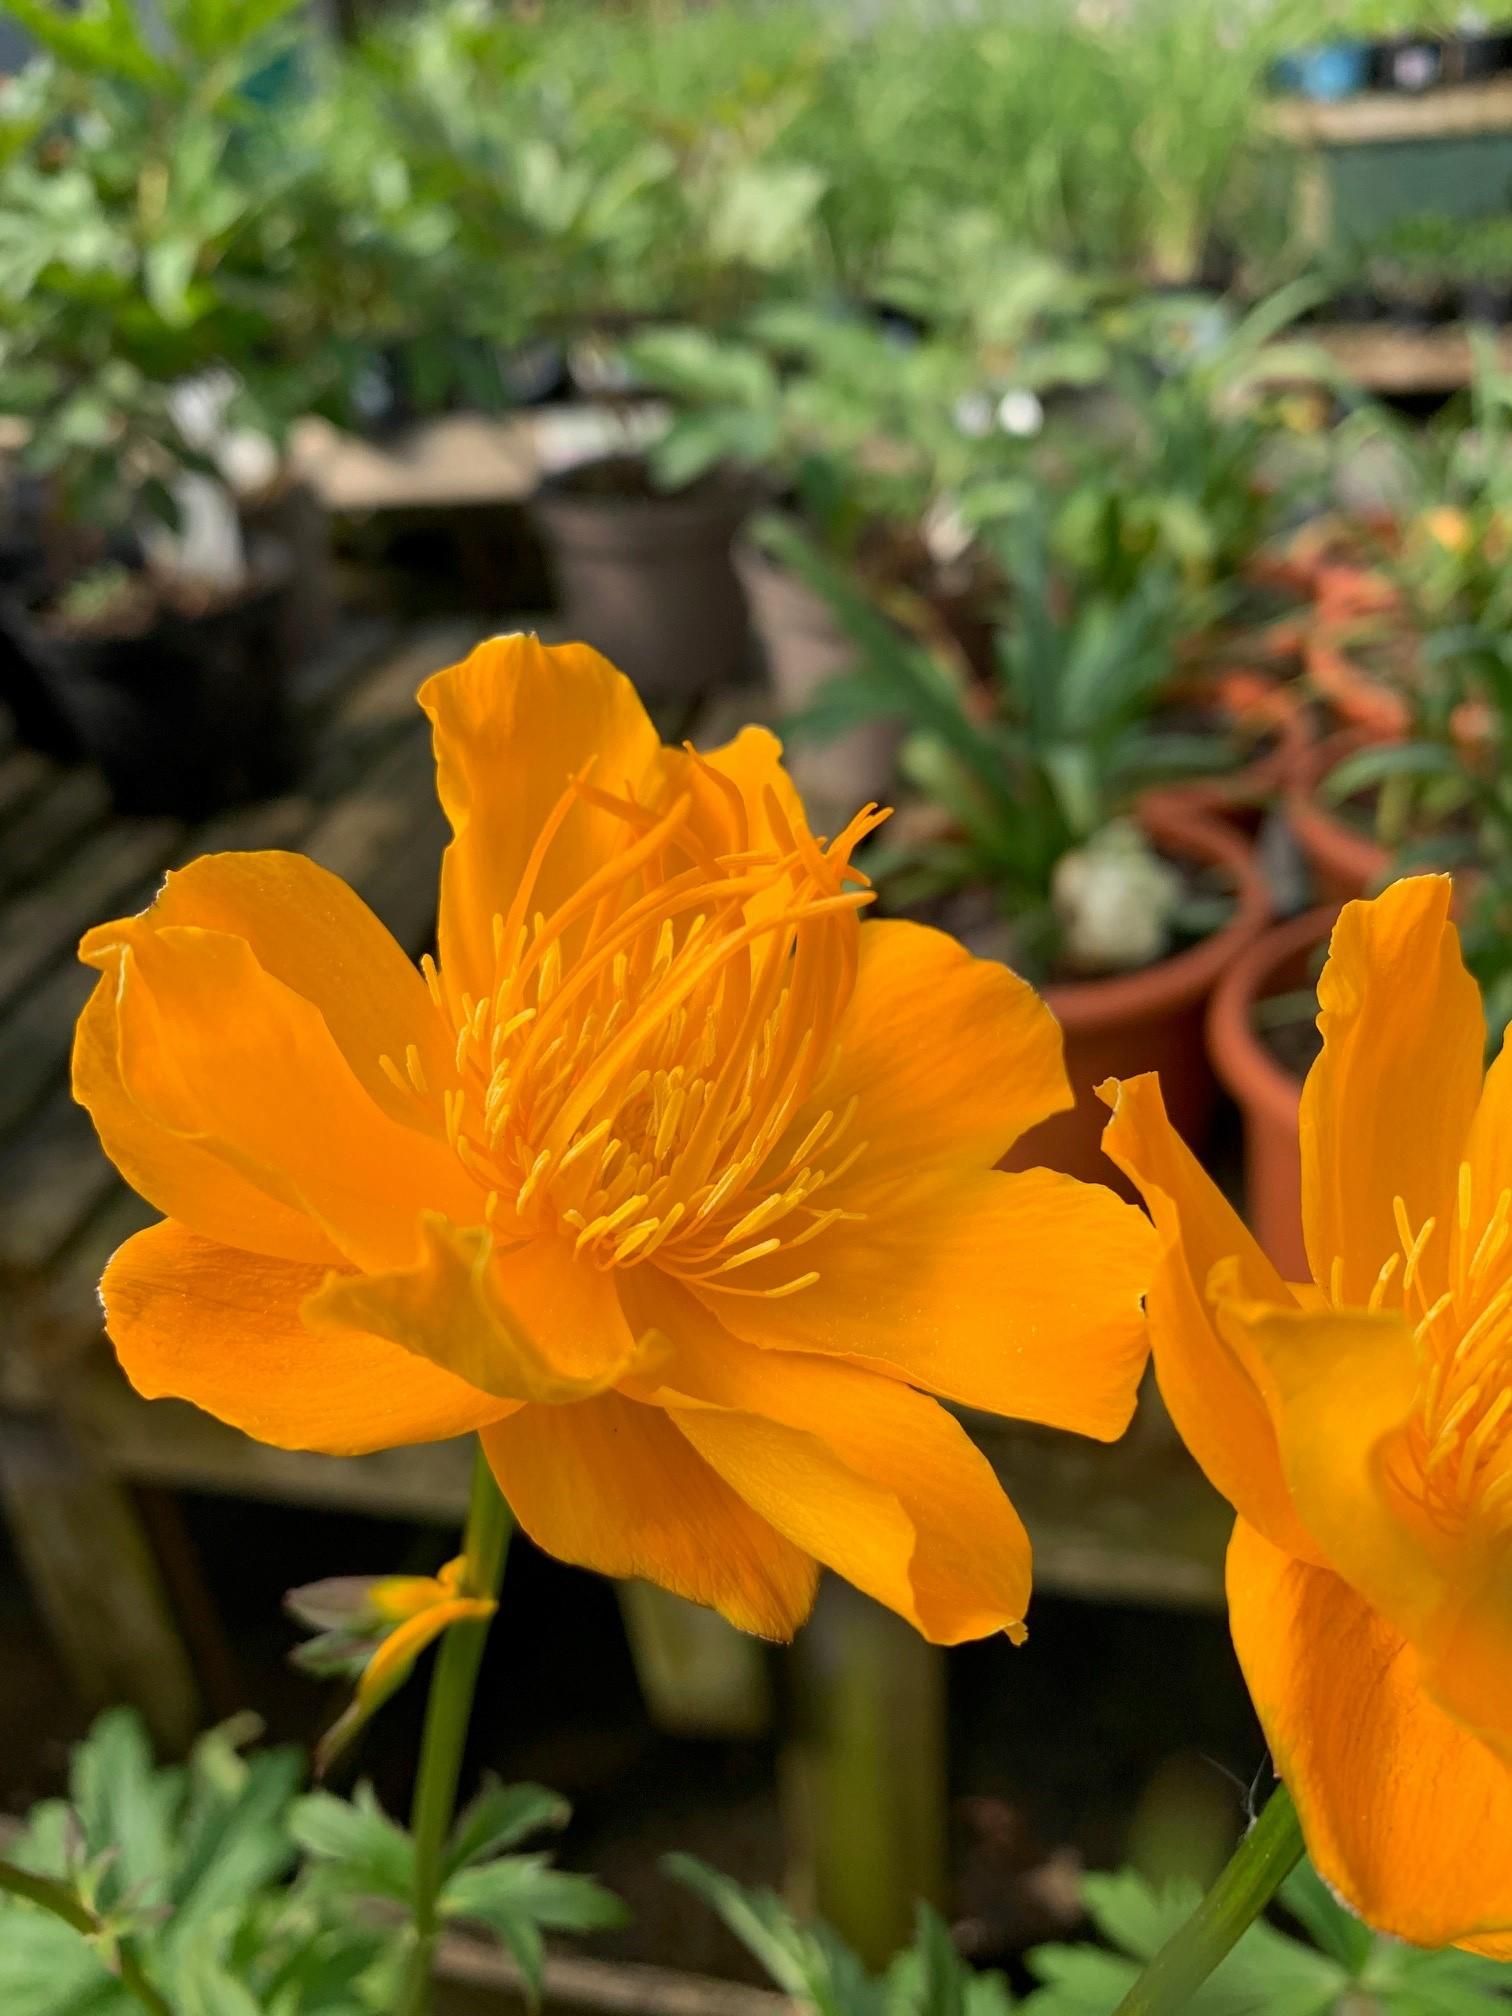 Yellow flowered perennial at Trevena Cross